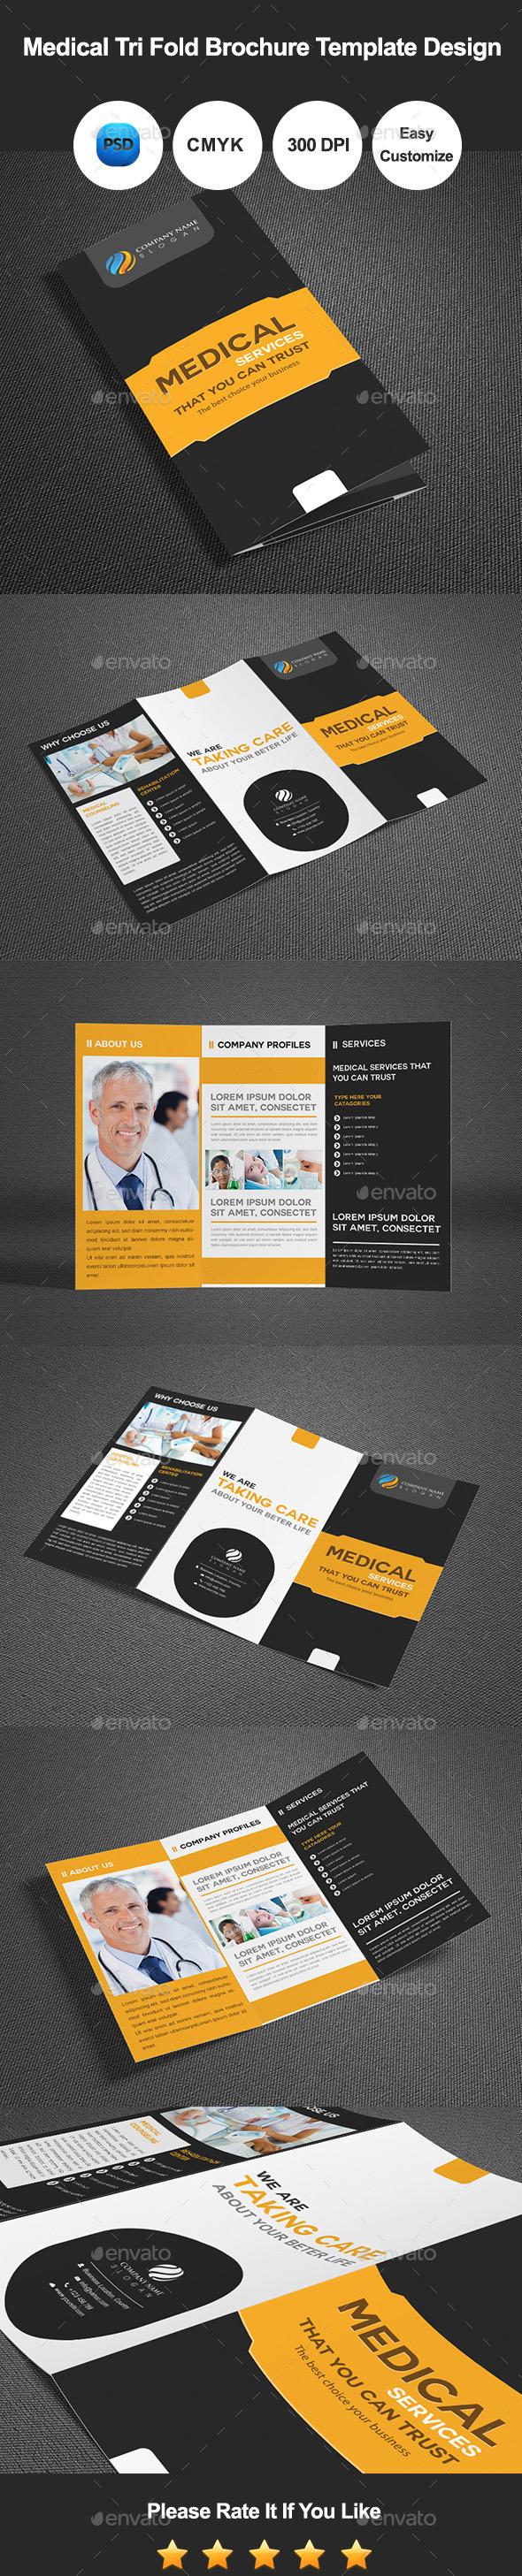 Medical Tri Fold Brochure Template Design - Corporate Brochures